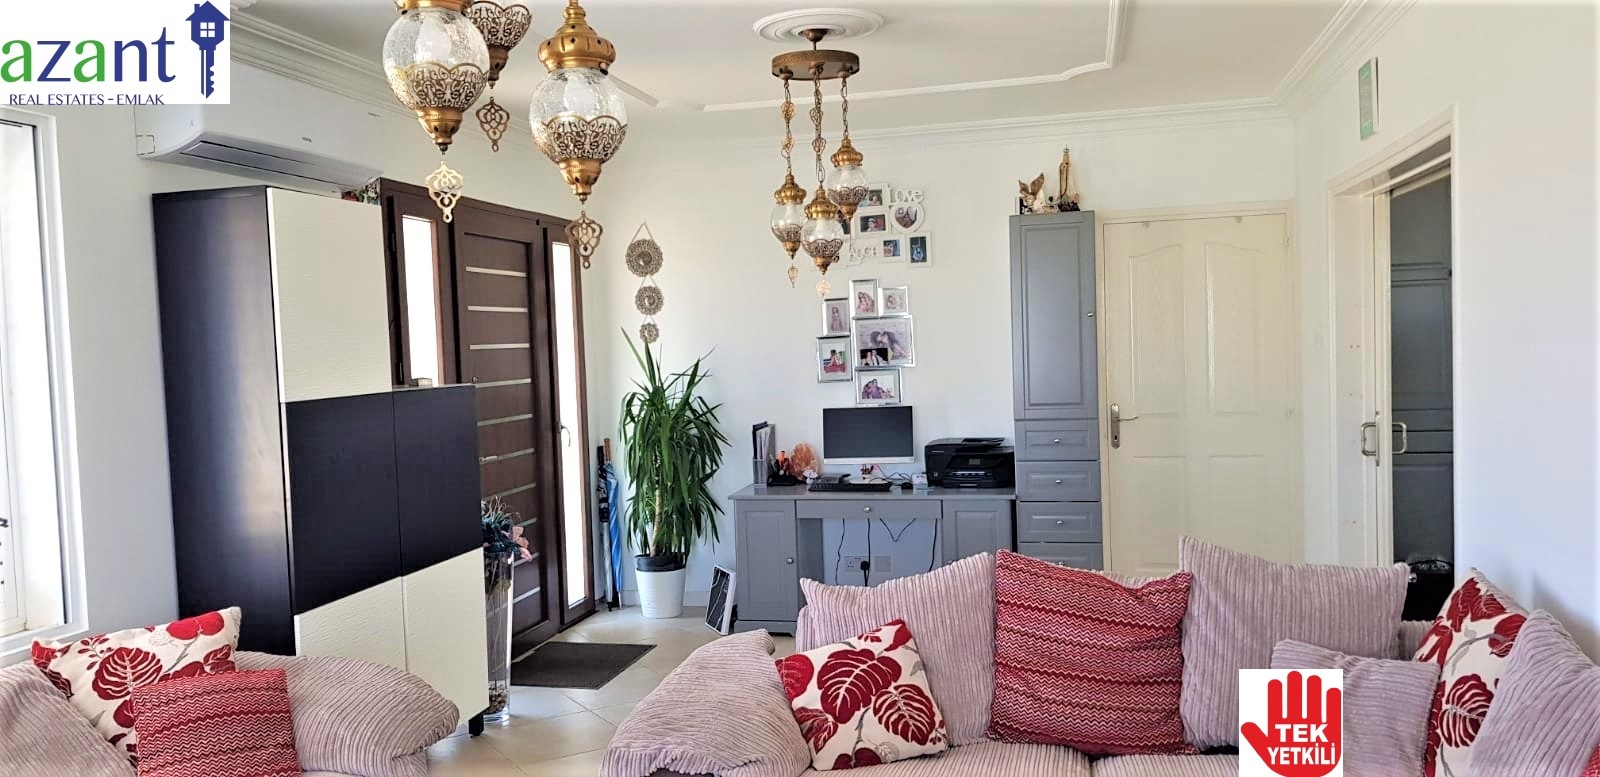 BEAUTIFUL 3 BEDROOM VILLA WITH POOL IN 1.5 DONUM PLOT IN ALSANCAK